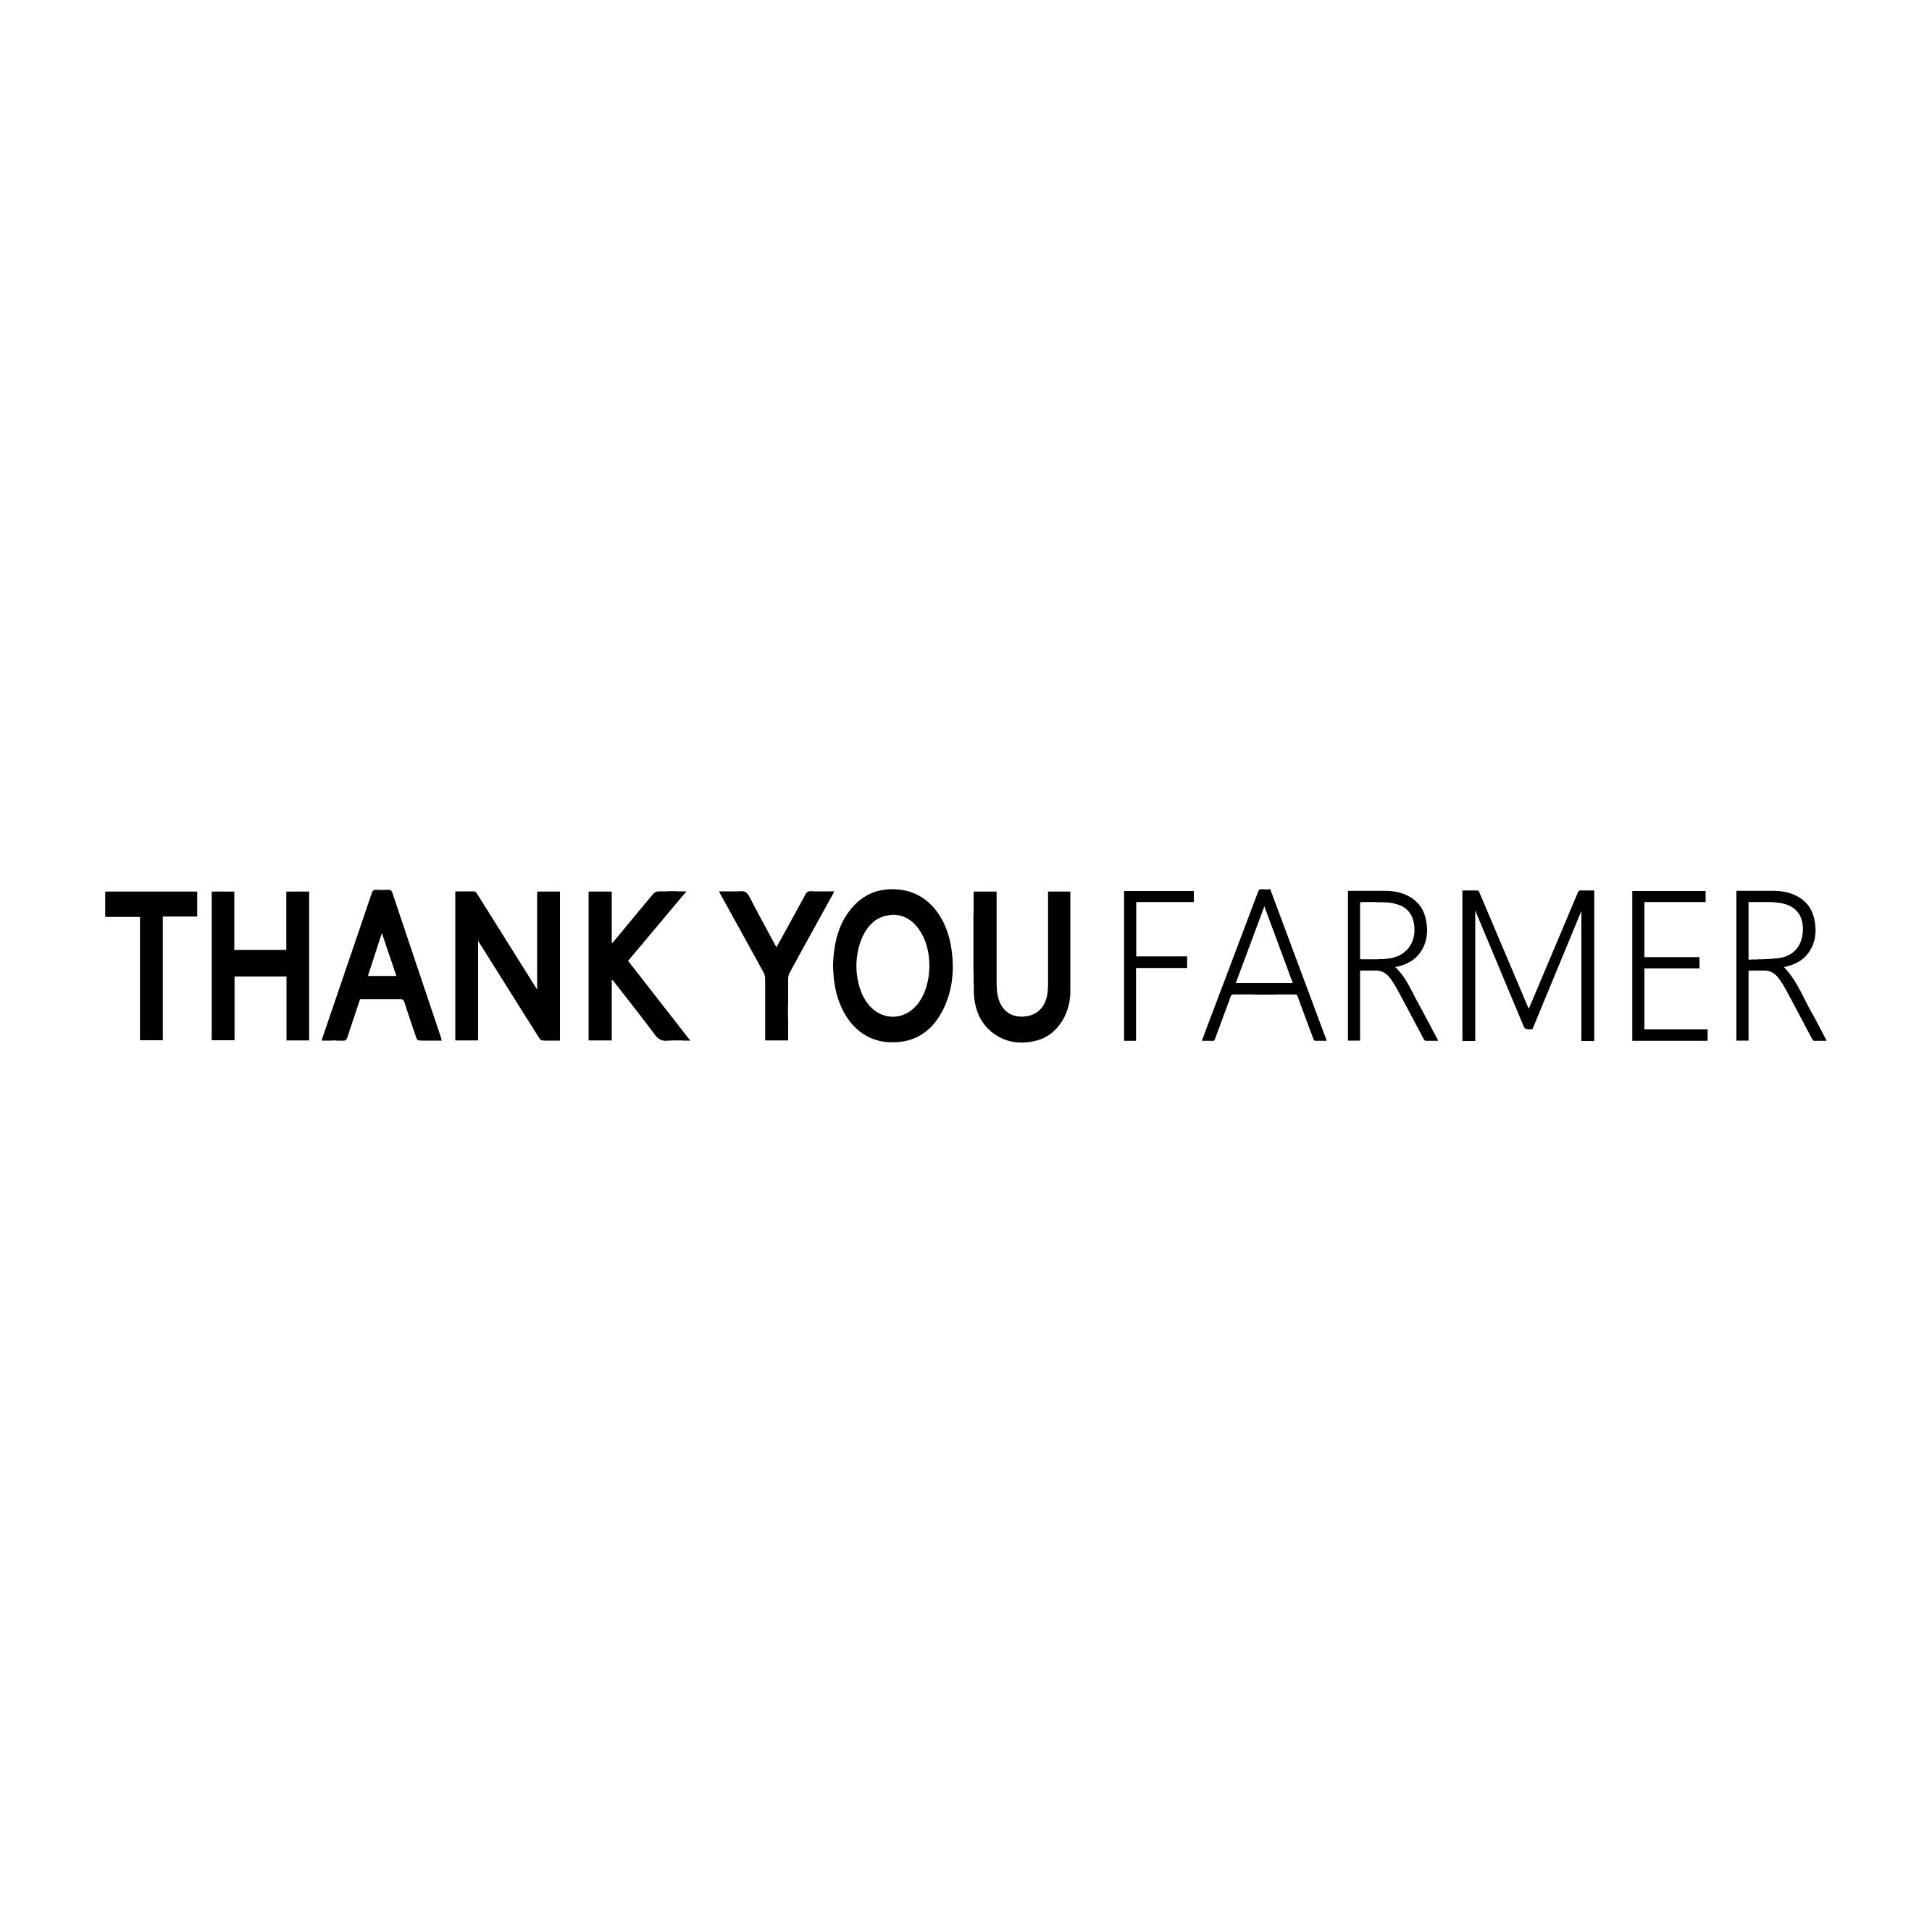 Thank You Farmer